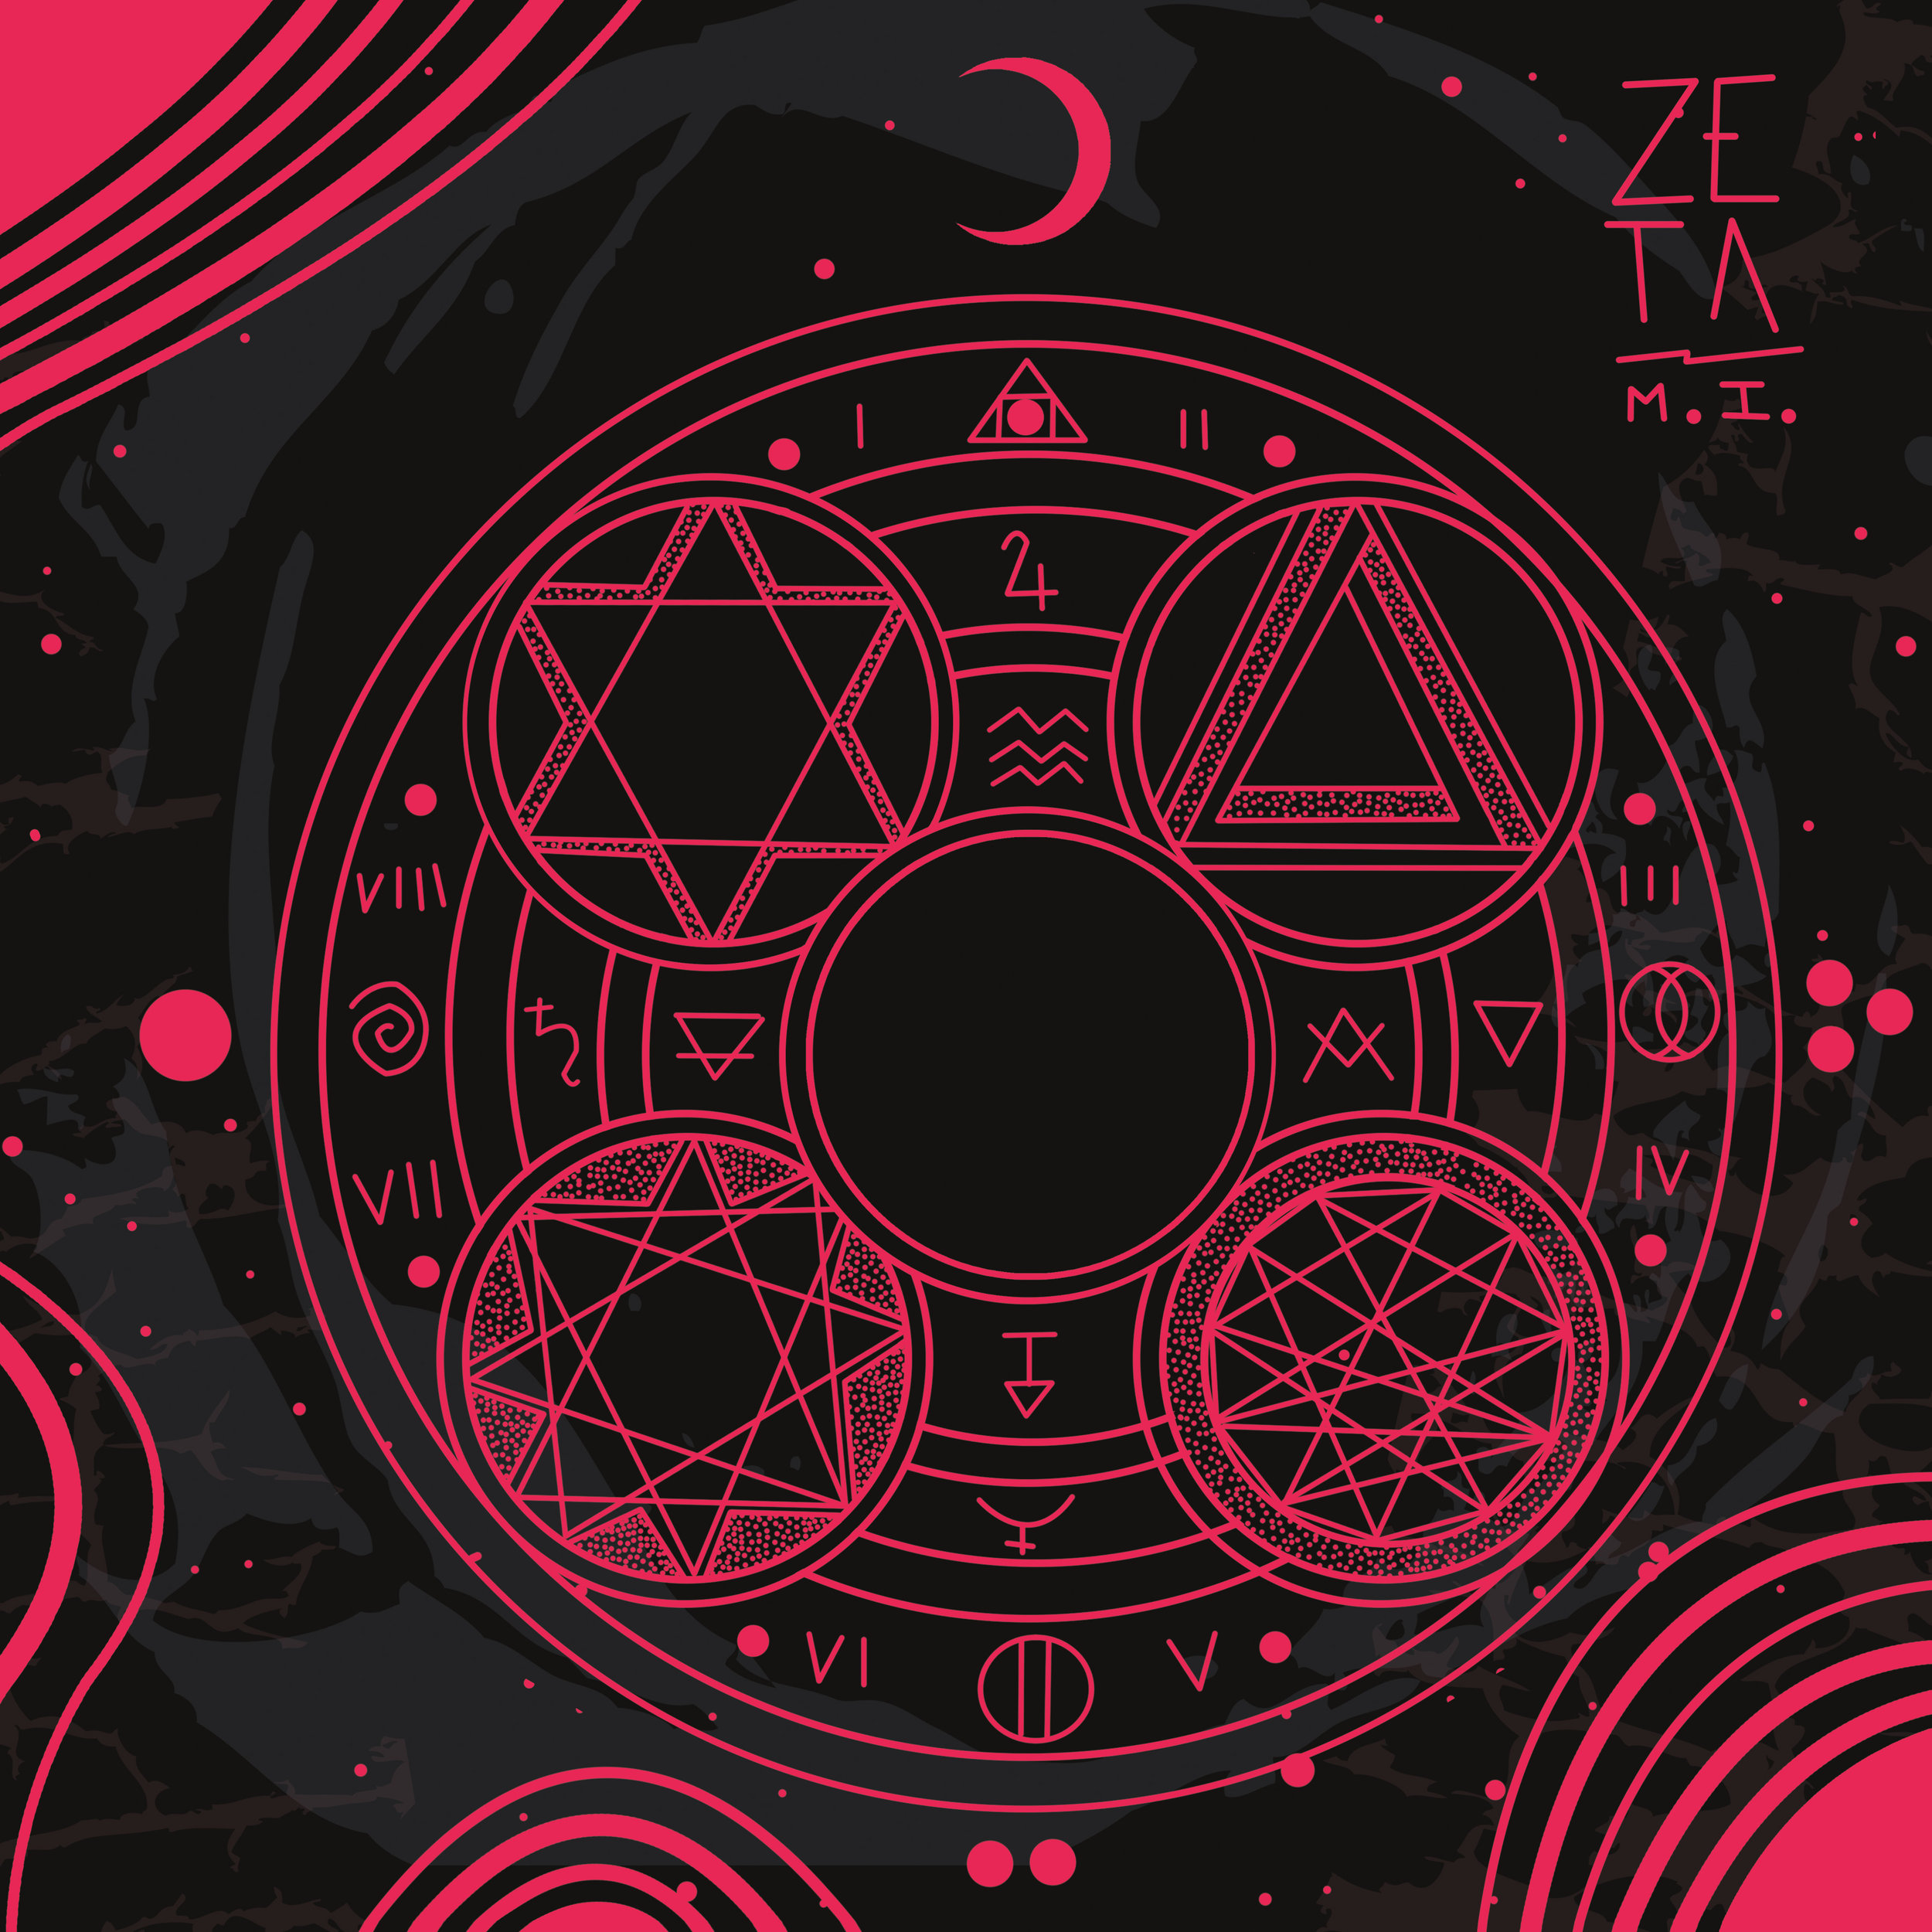 Zeta - Magia Infinita LP - $14